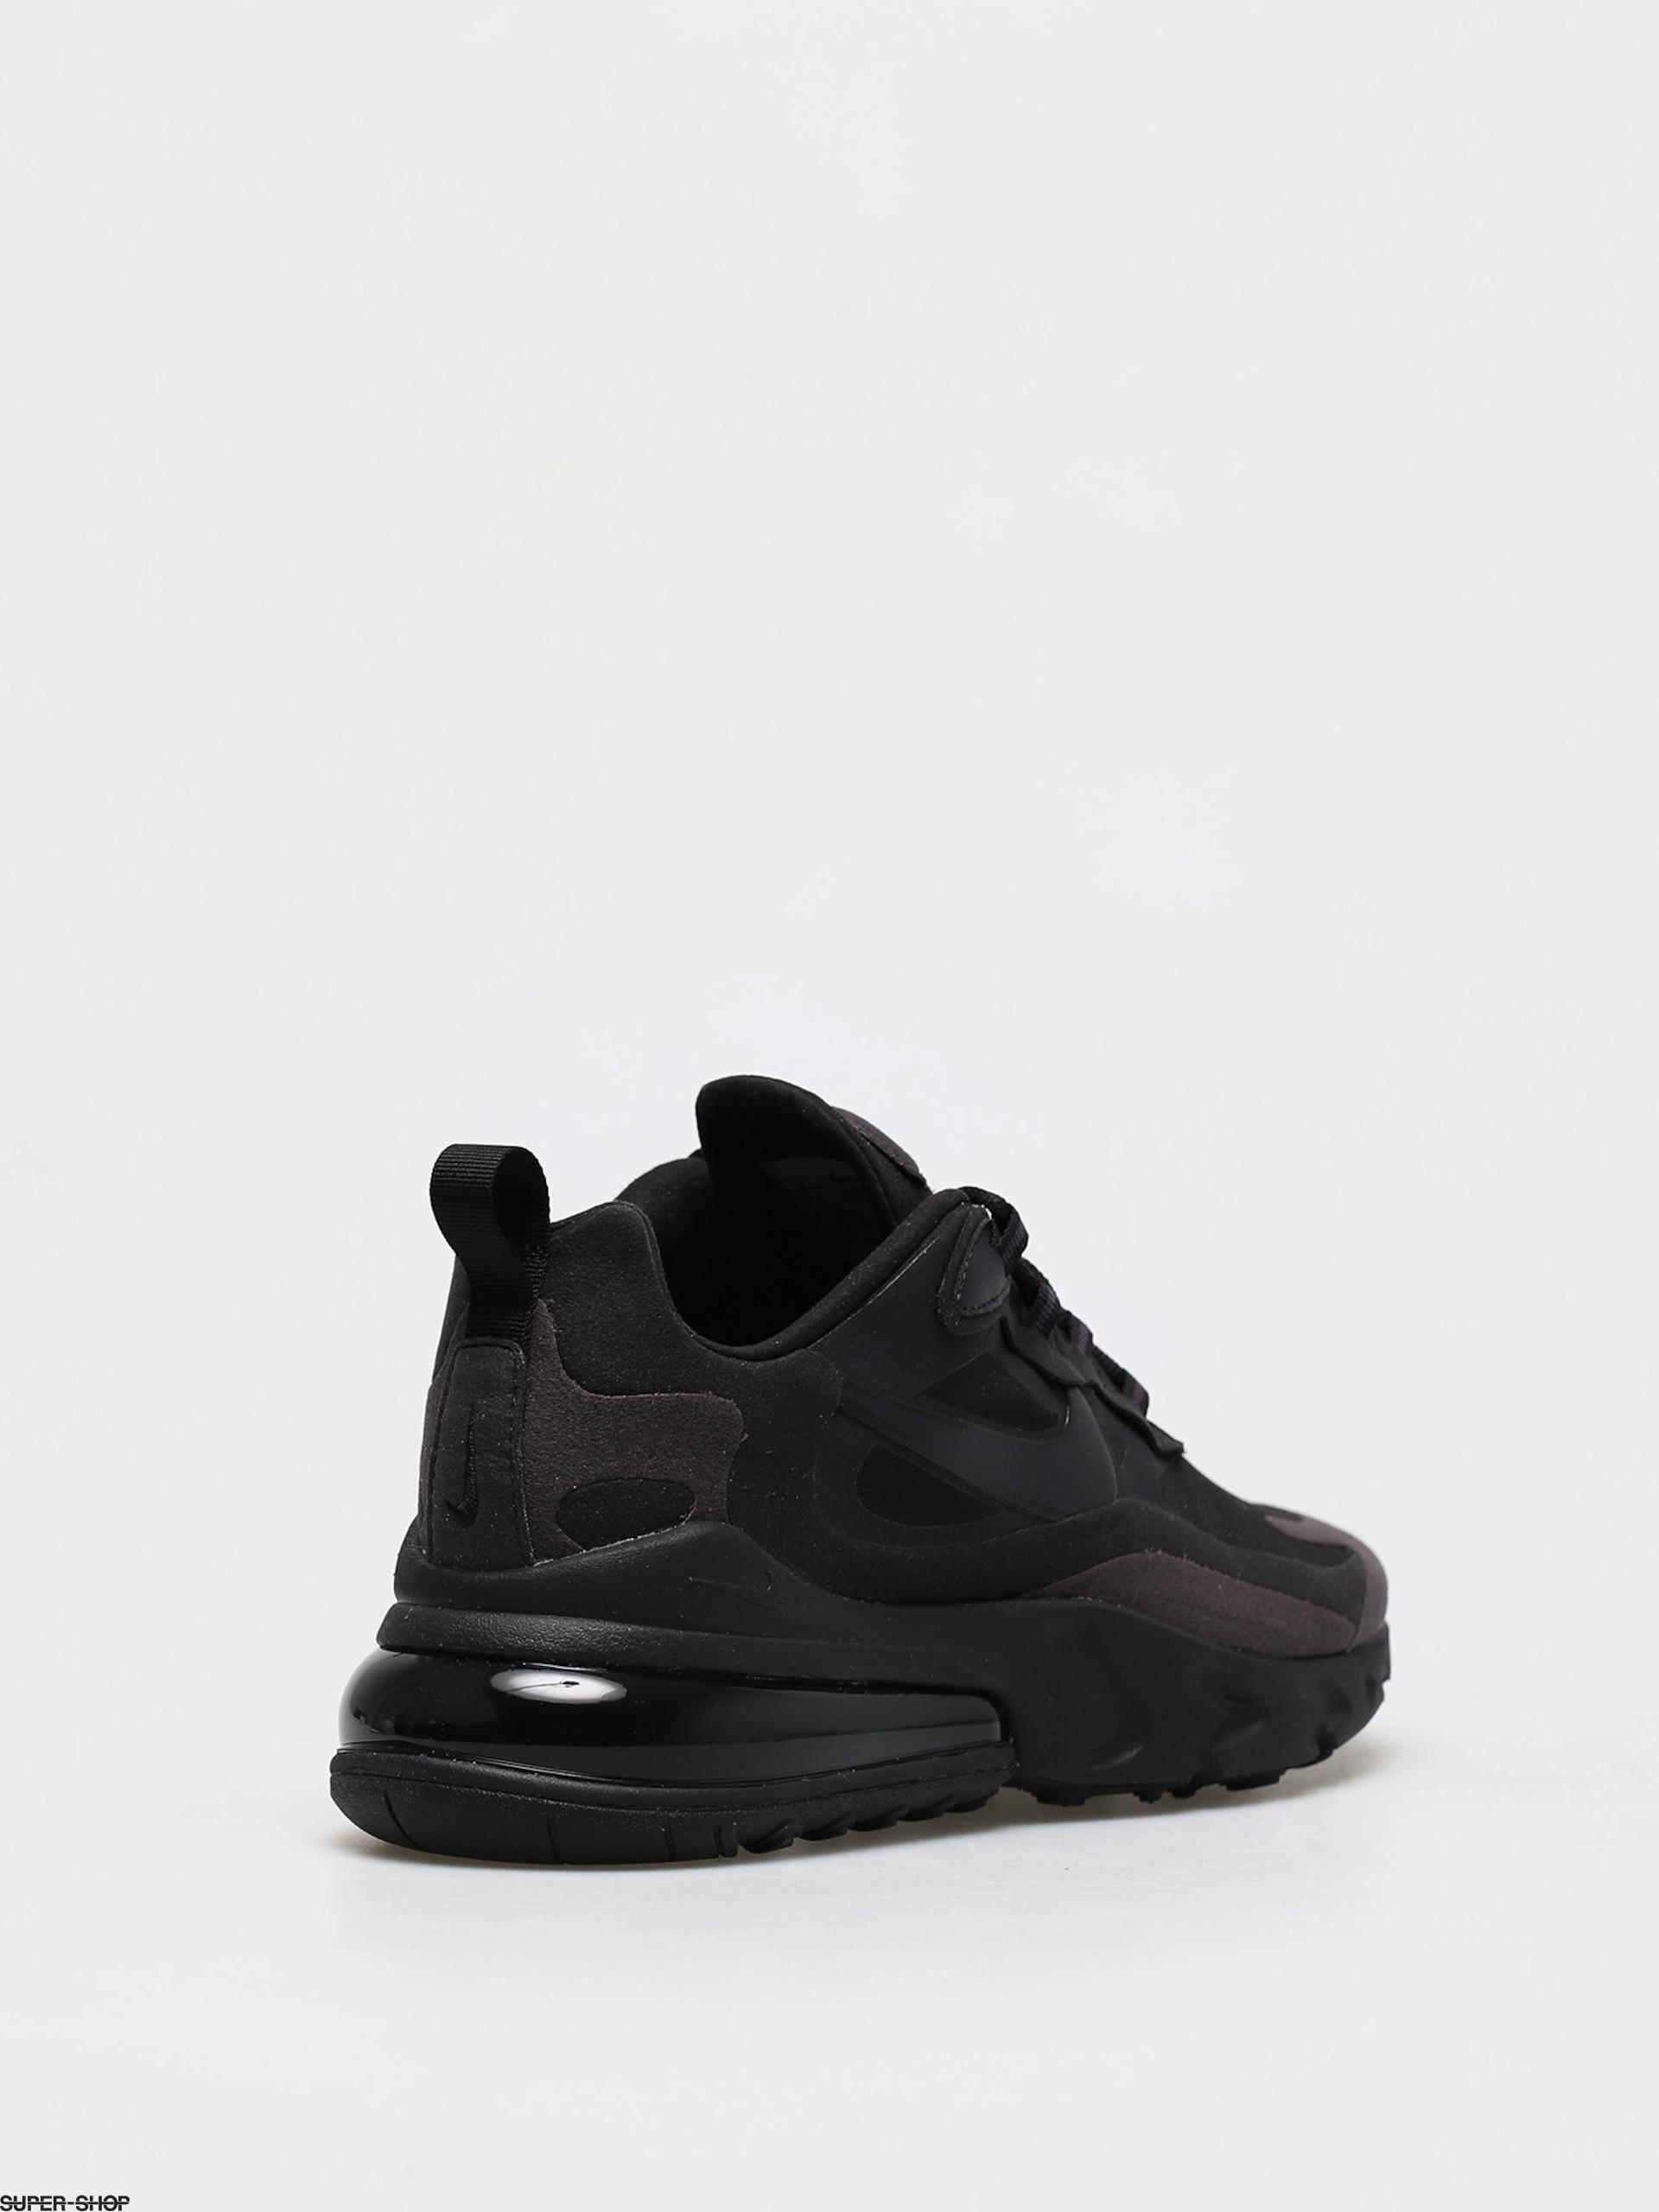 código Ejército taquigrafía  Nike Air Max 270 React Shoes (black/oil grey oil grey black)